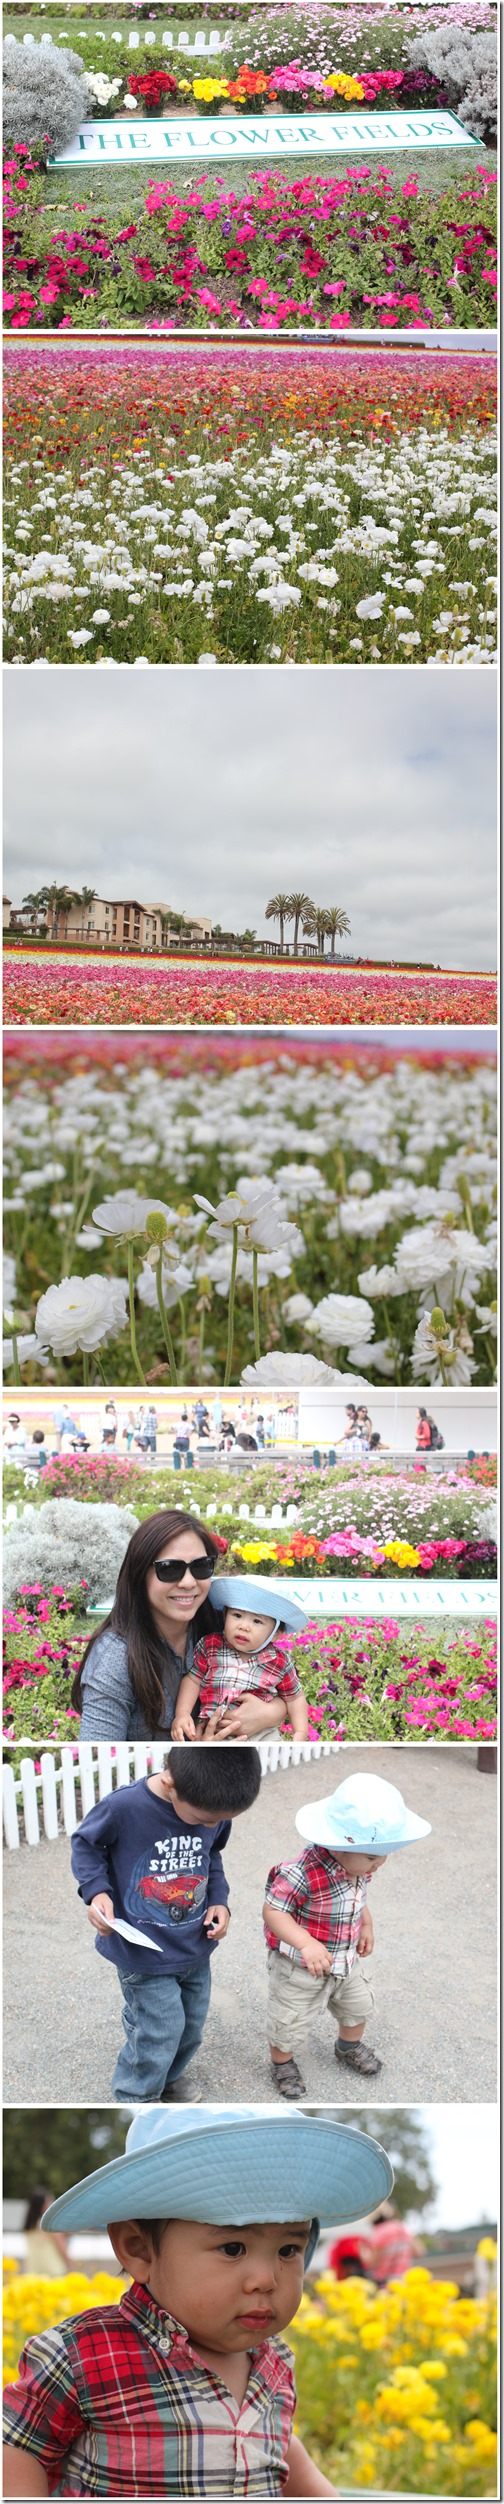 flowerfields_carlsbad